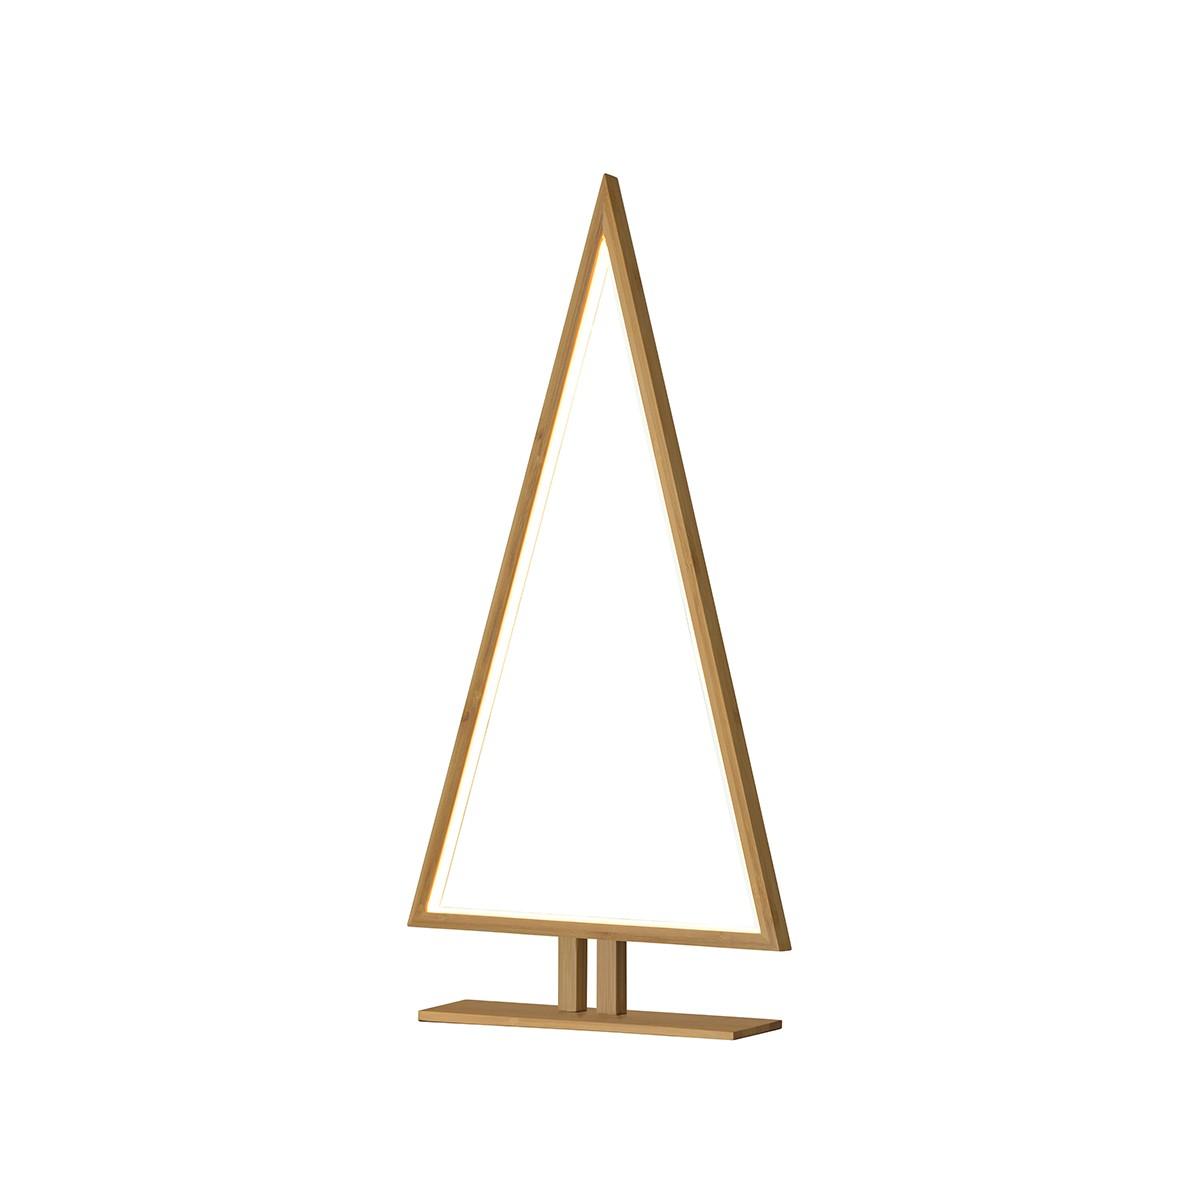 Sompex Pinewood LED Tischleuchte, Höhe: 65 cm, bambus